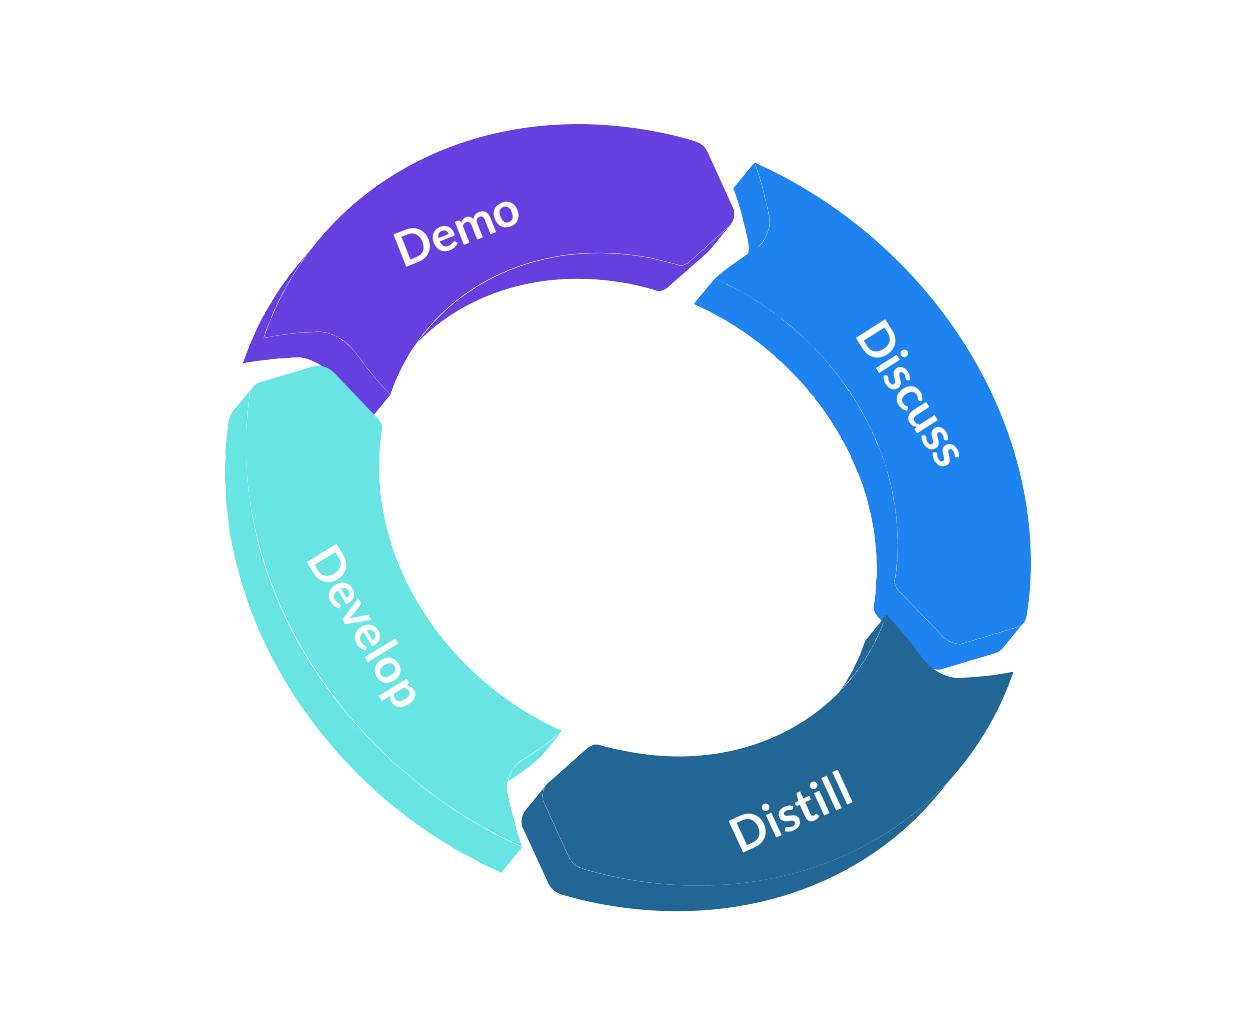 modernized-technology--software-delivery